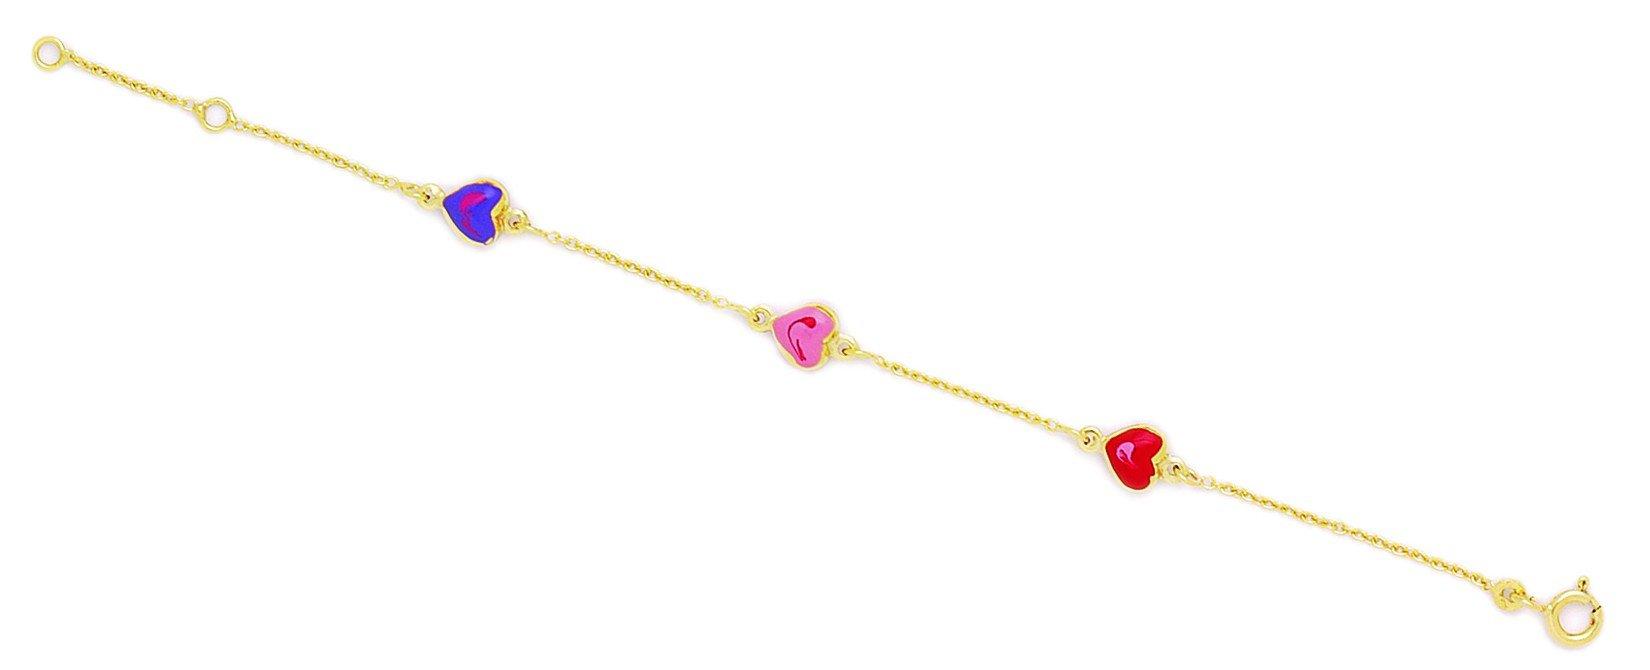 14k Yellow Gold 5.75 Inch Adjustable Three Hearts Enamel Baby Id Bracelet - Measures 6mm